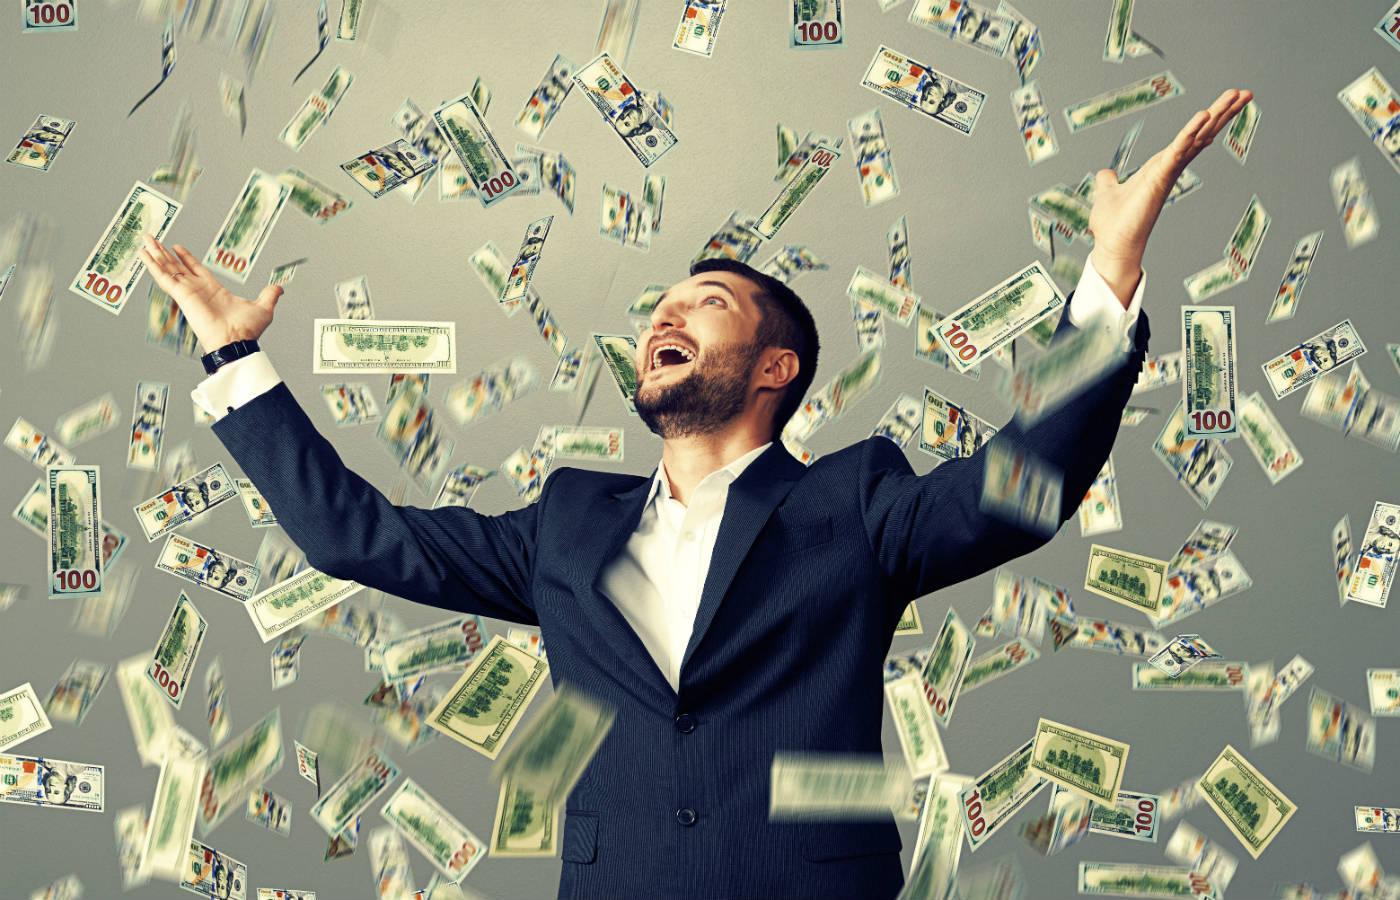 6 características pouco conhecidas de empreendedores de sucesso